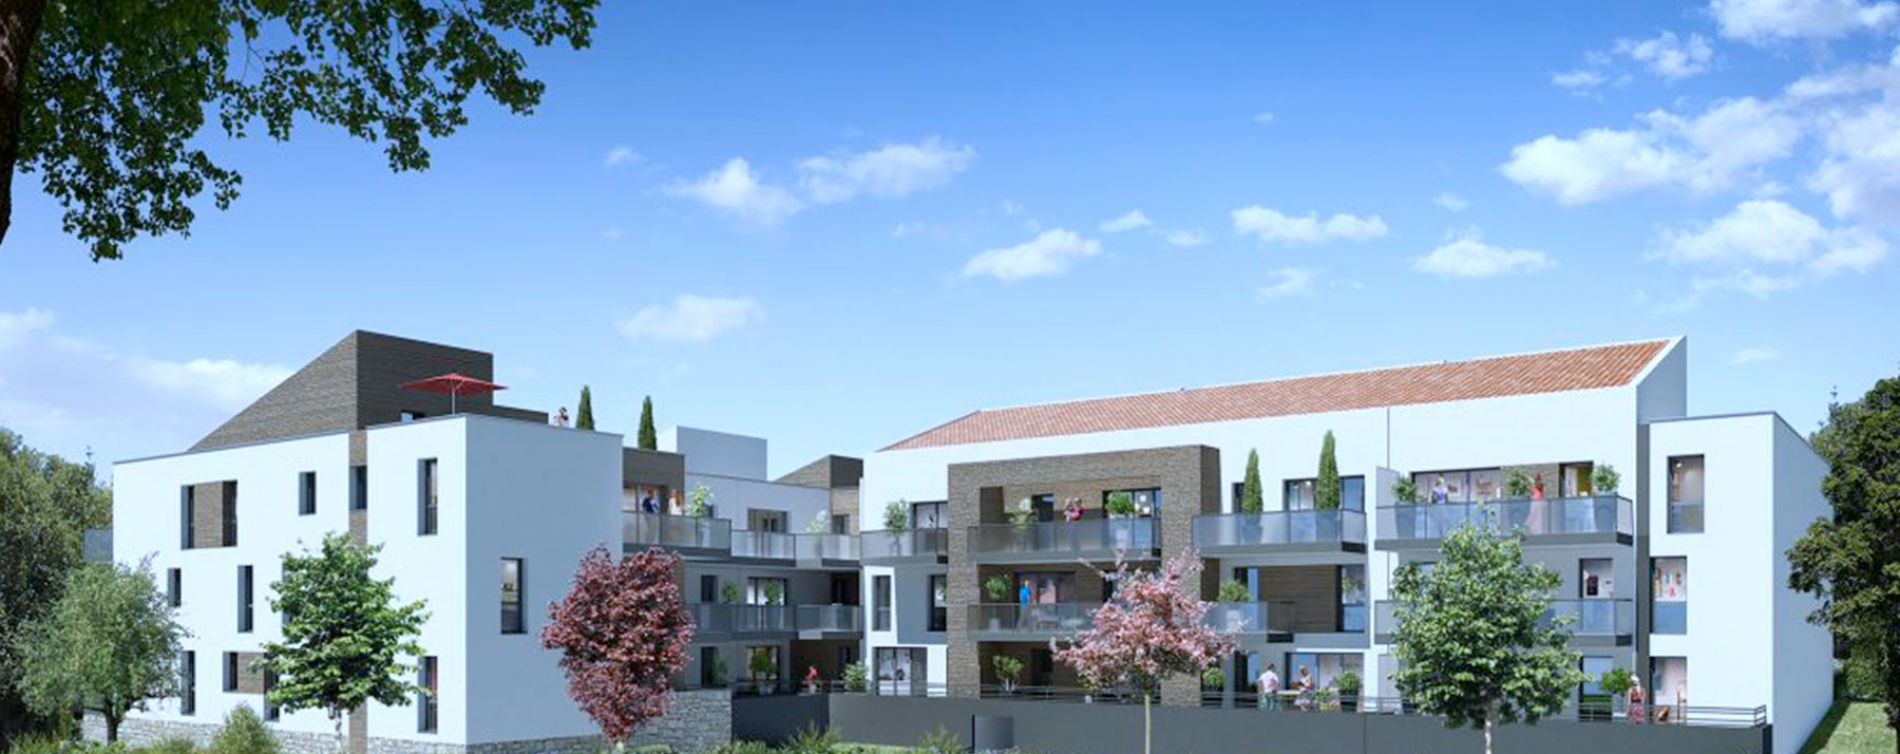 Résidence Villa Romarin à Saint-Brès